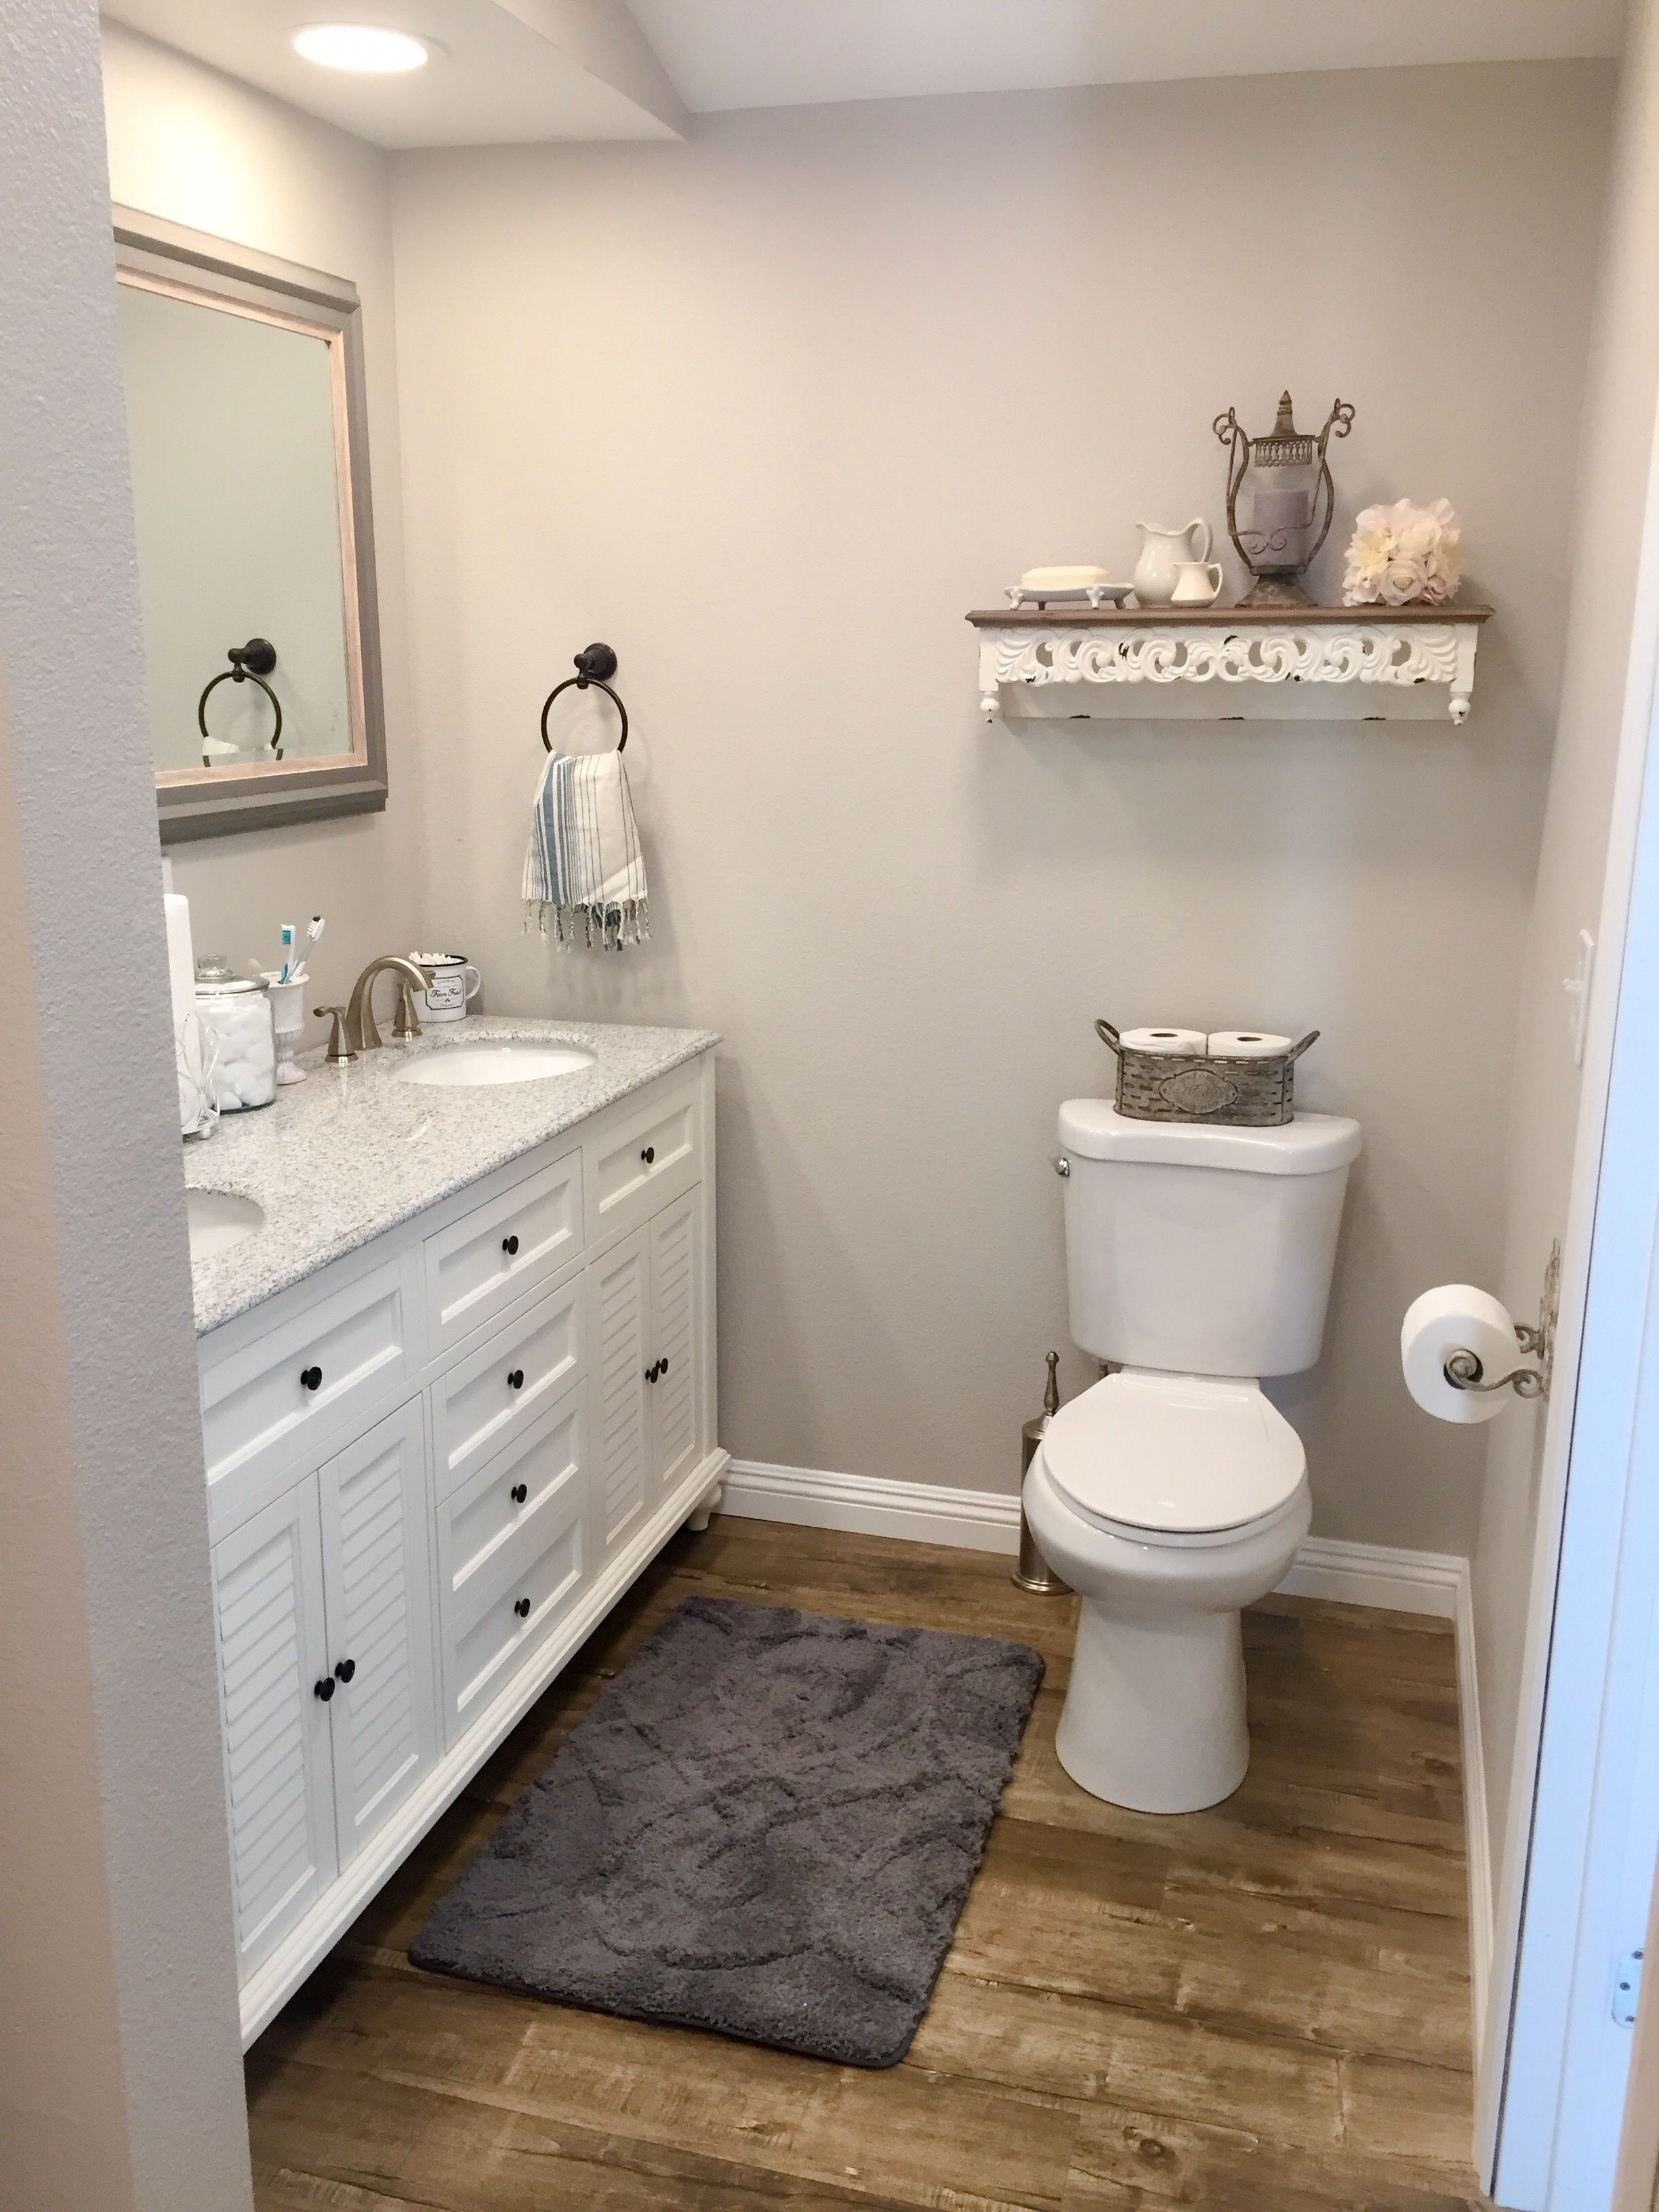 French Country Farmhouse Bathroom Design Small